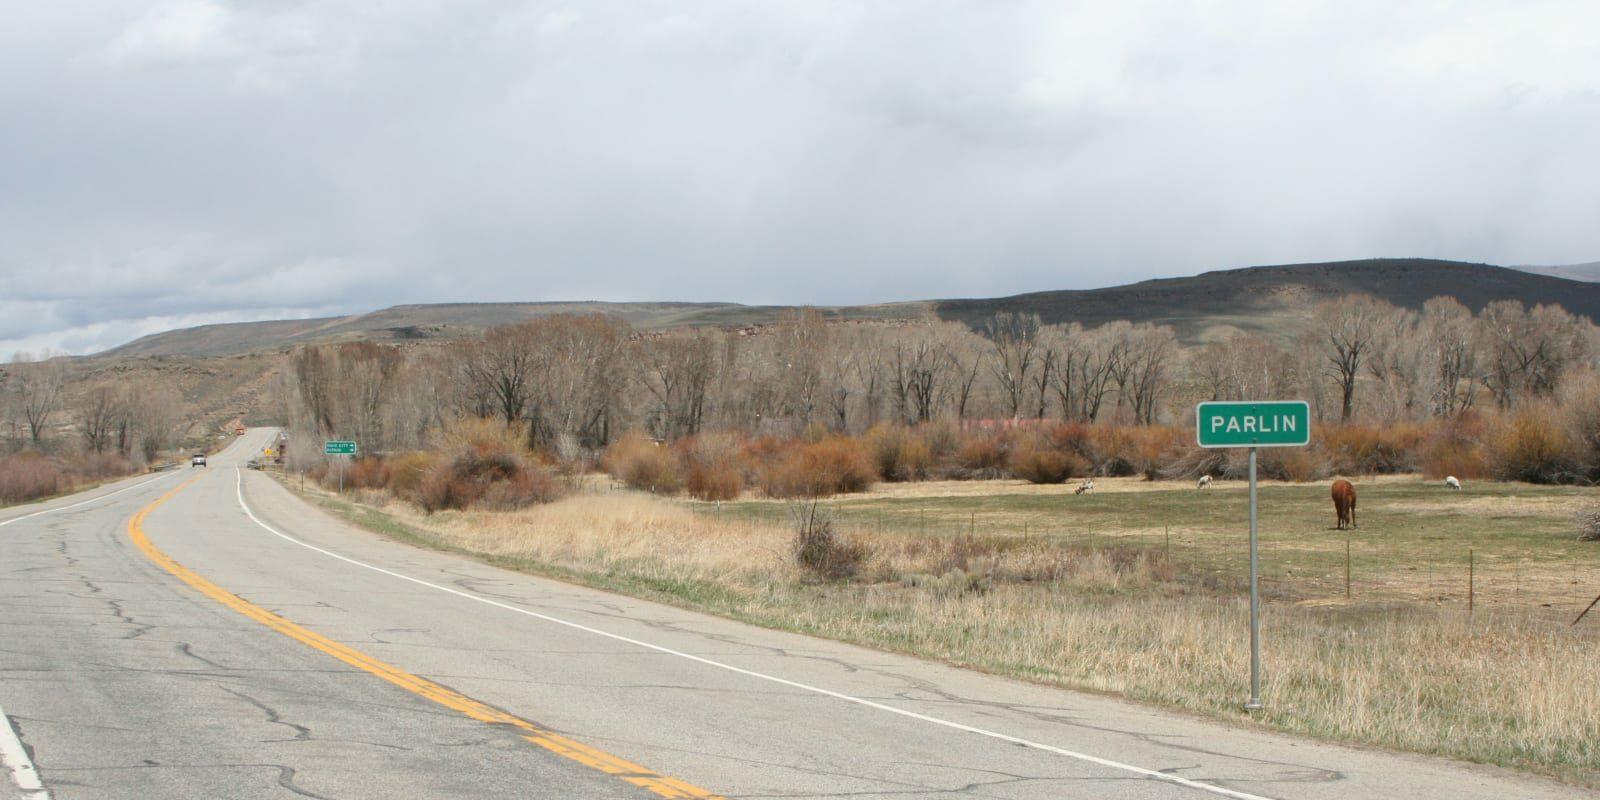 Parlin Colorado Town Limits Sign